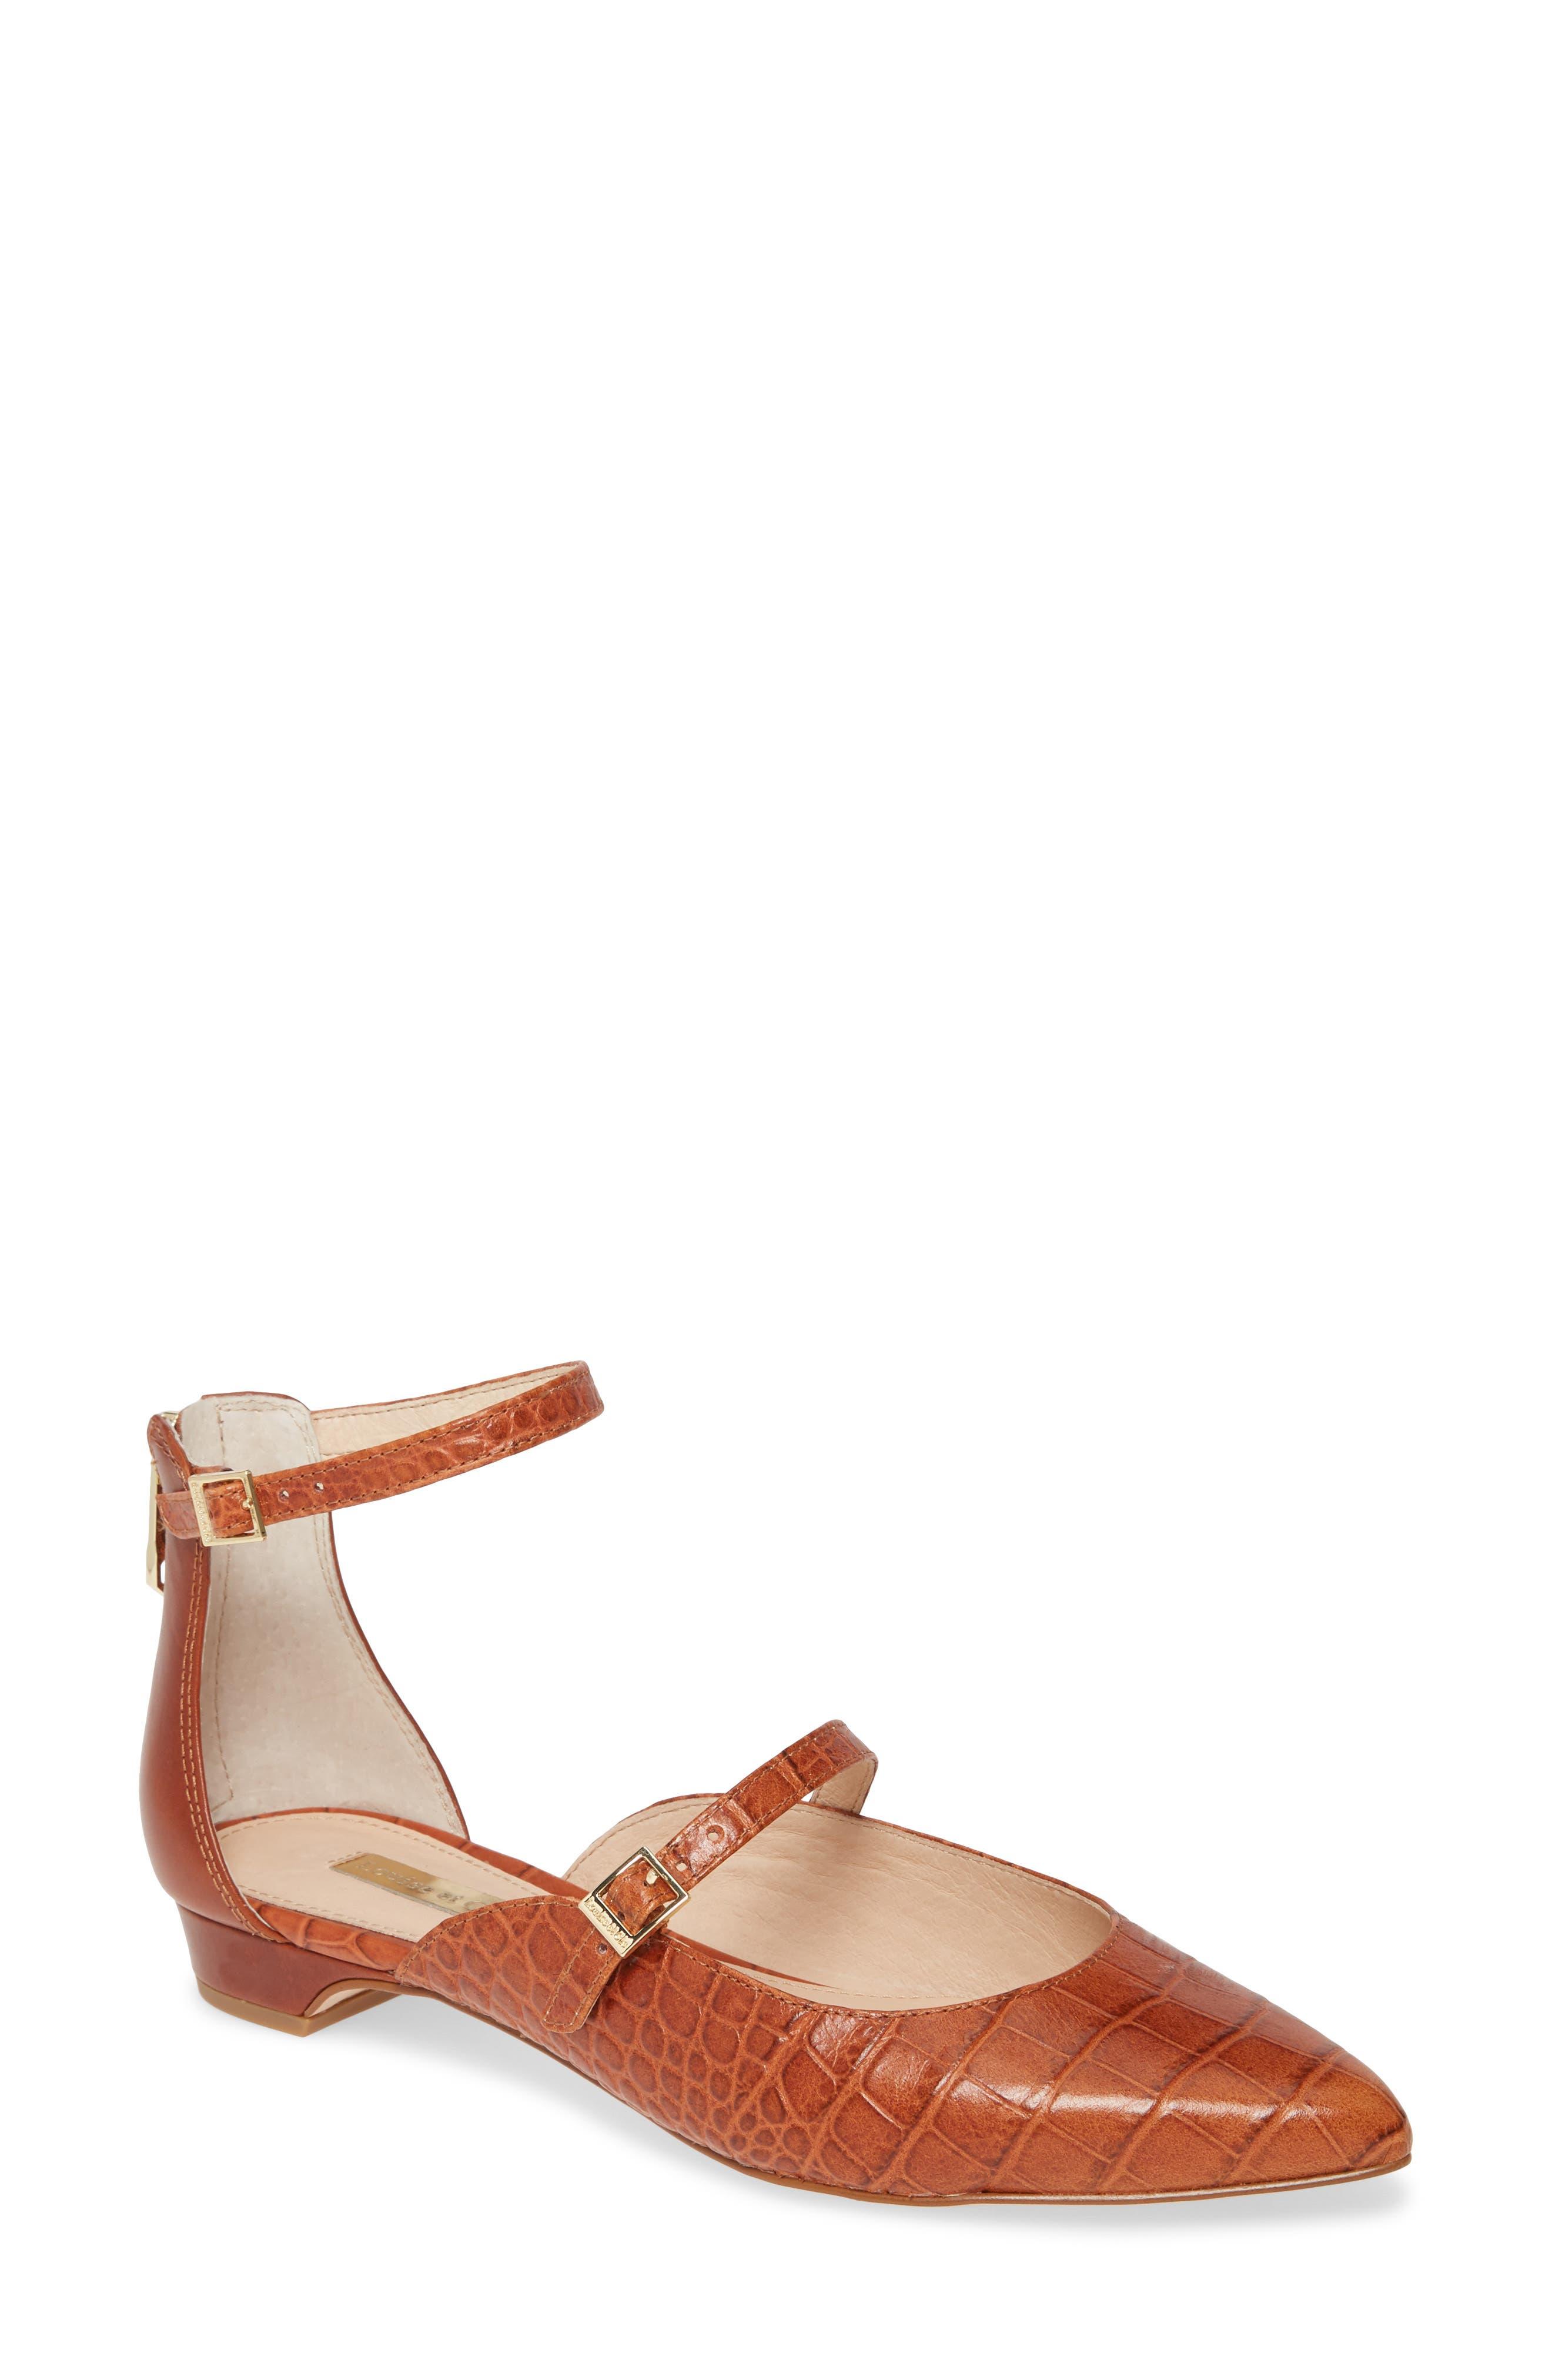 Louise Et Cie Claire Ankle Strap Flat, Brown